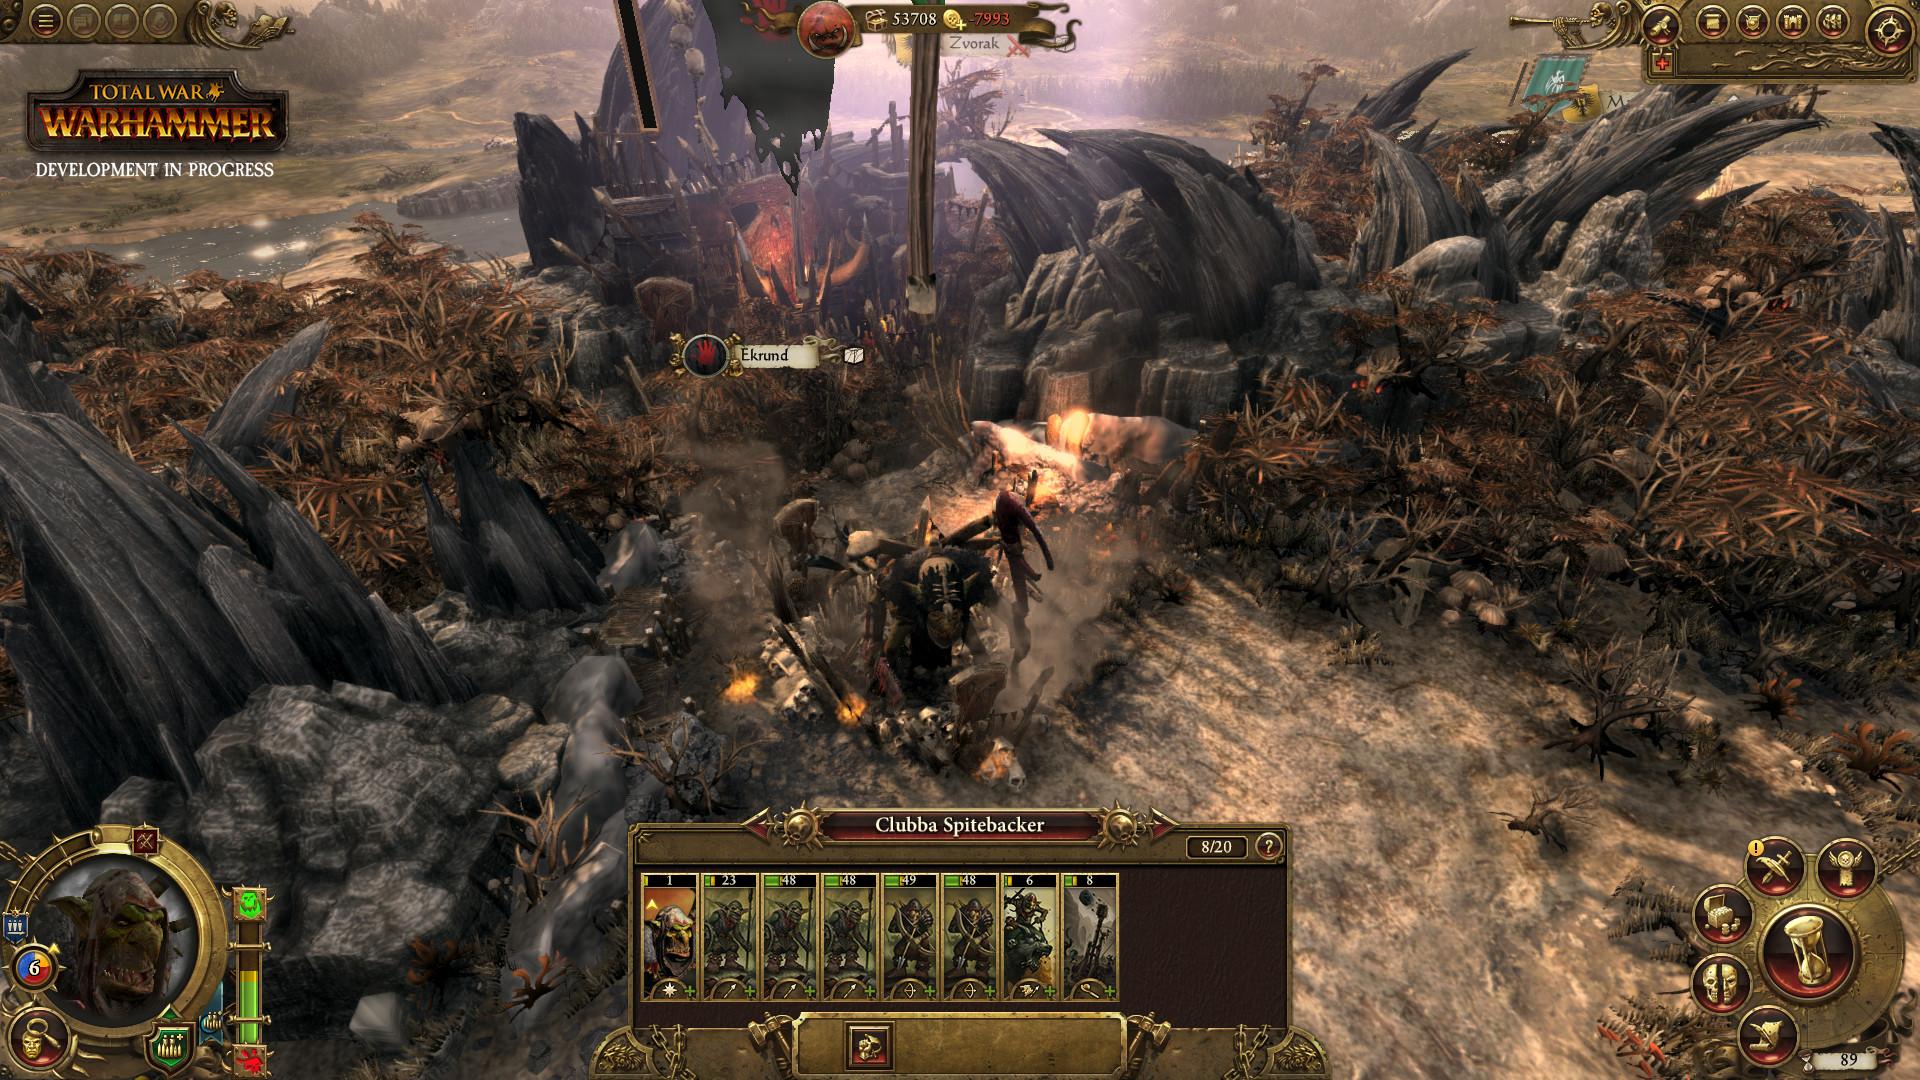 Total War: Warhammer Screenshot 1